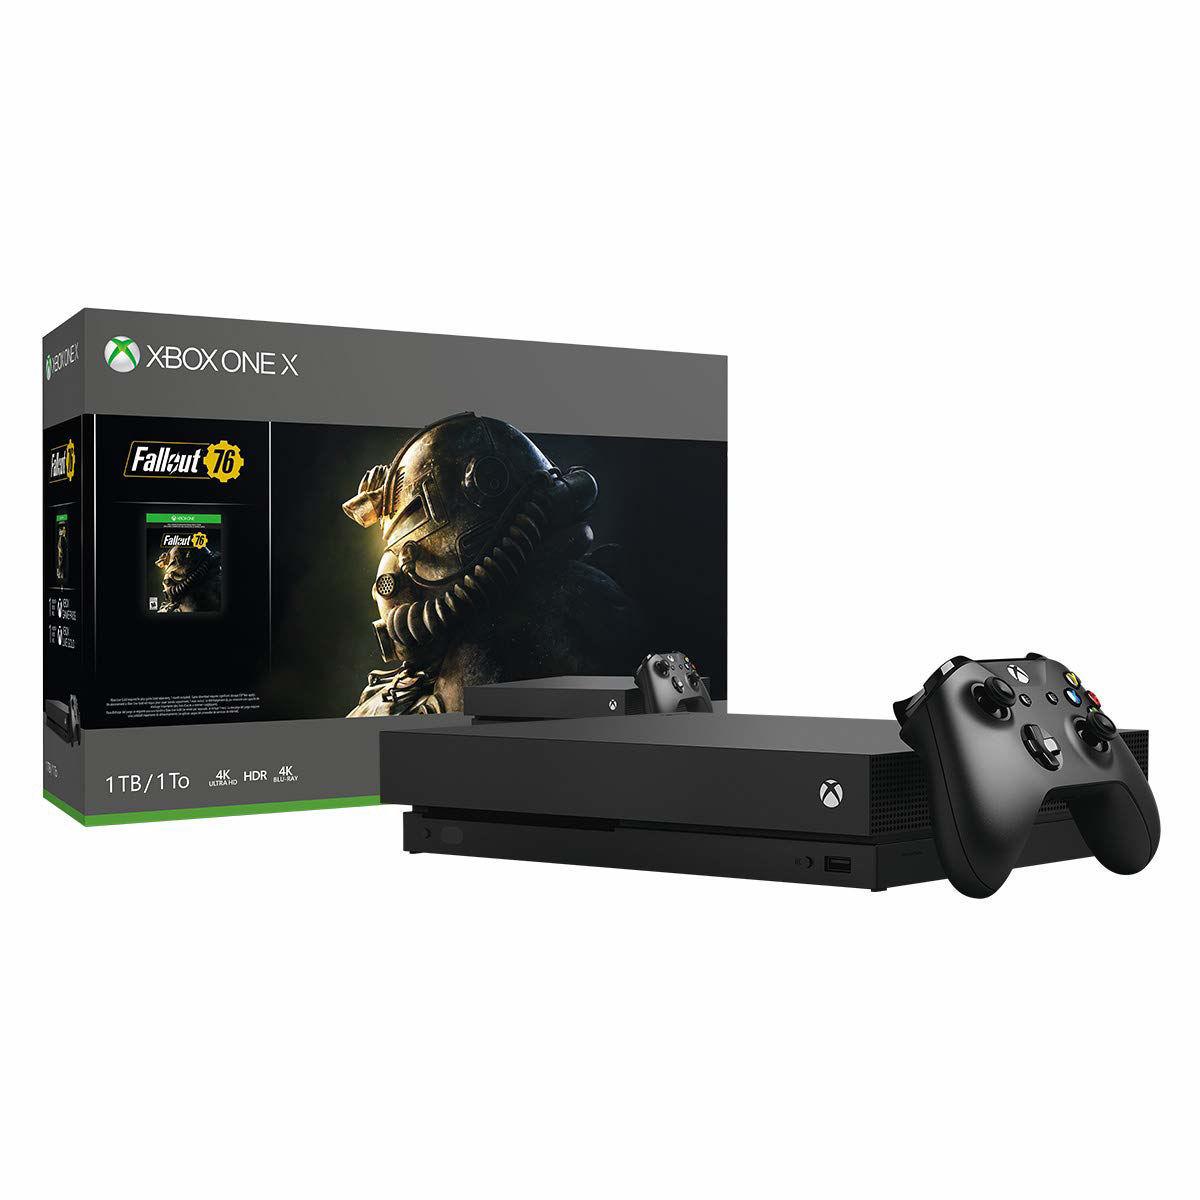 Изображение Xbox One X Fallout 76 Bundle (1TB)